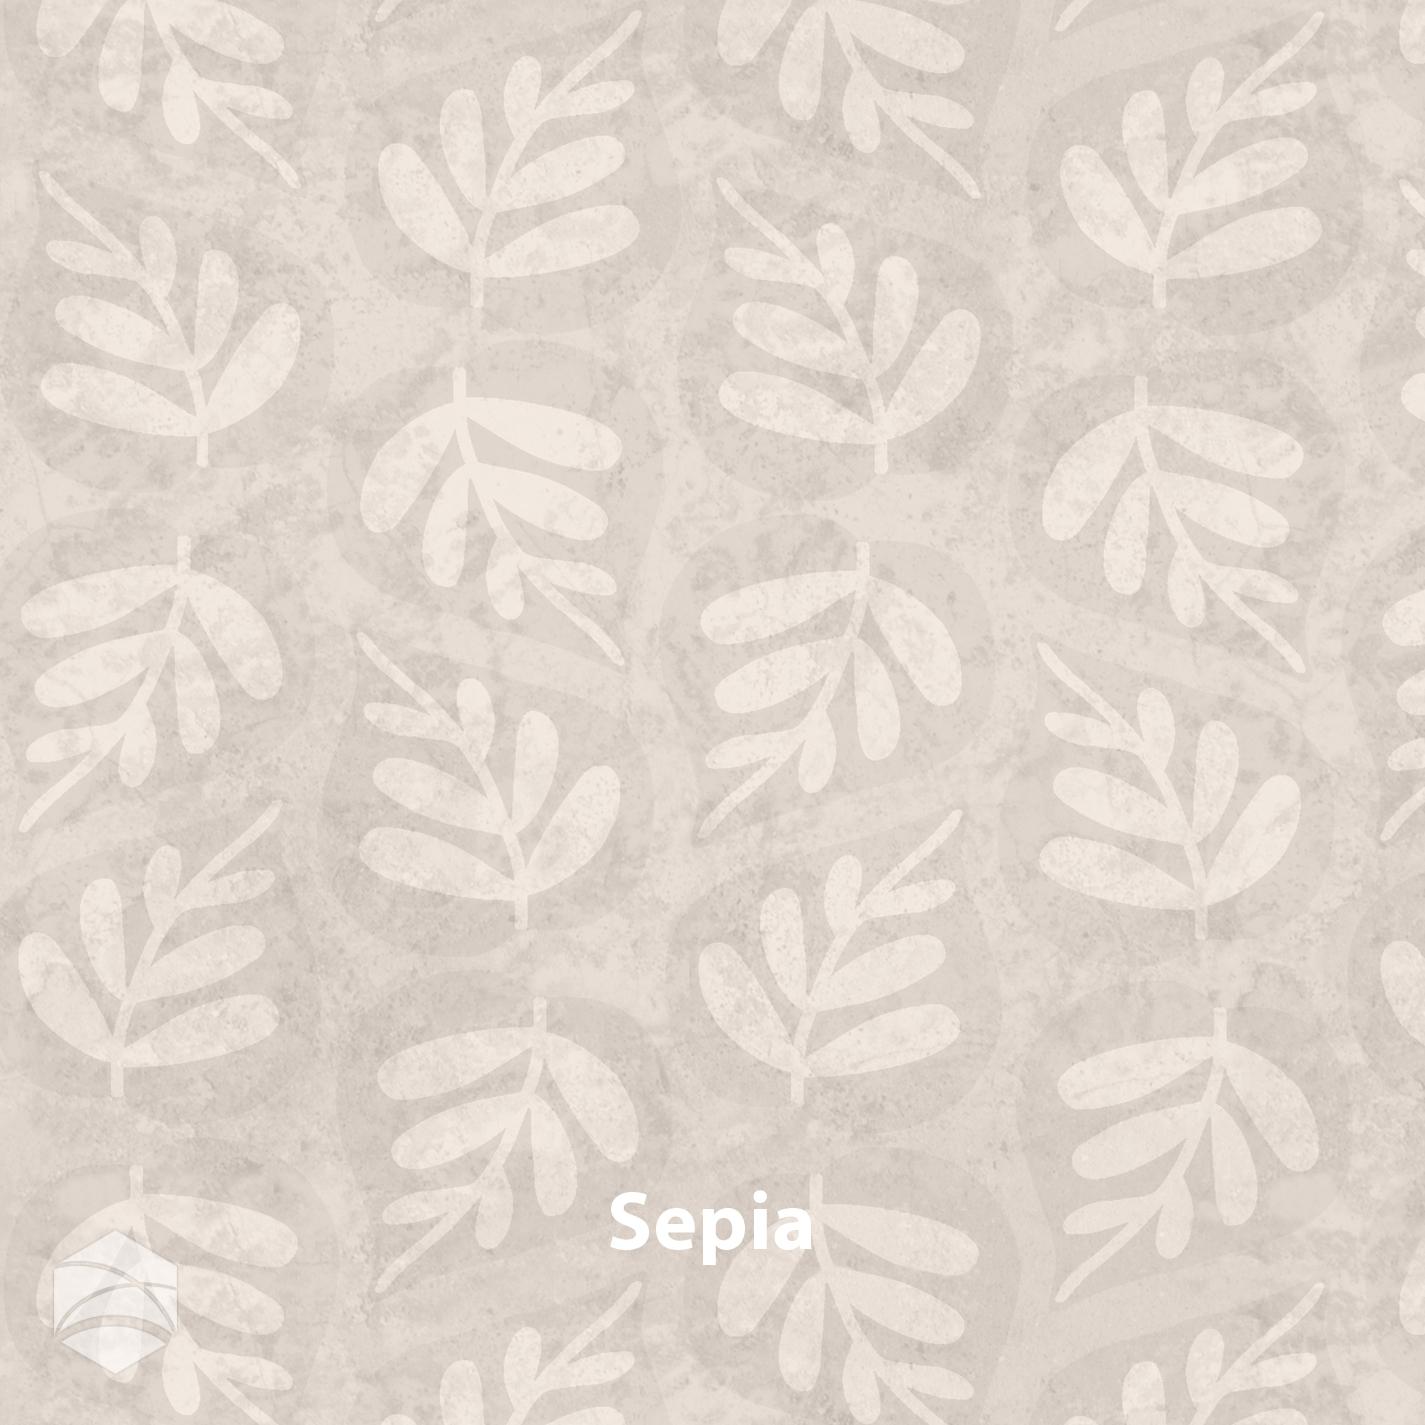 Sepia_V2_14x14.jpg